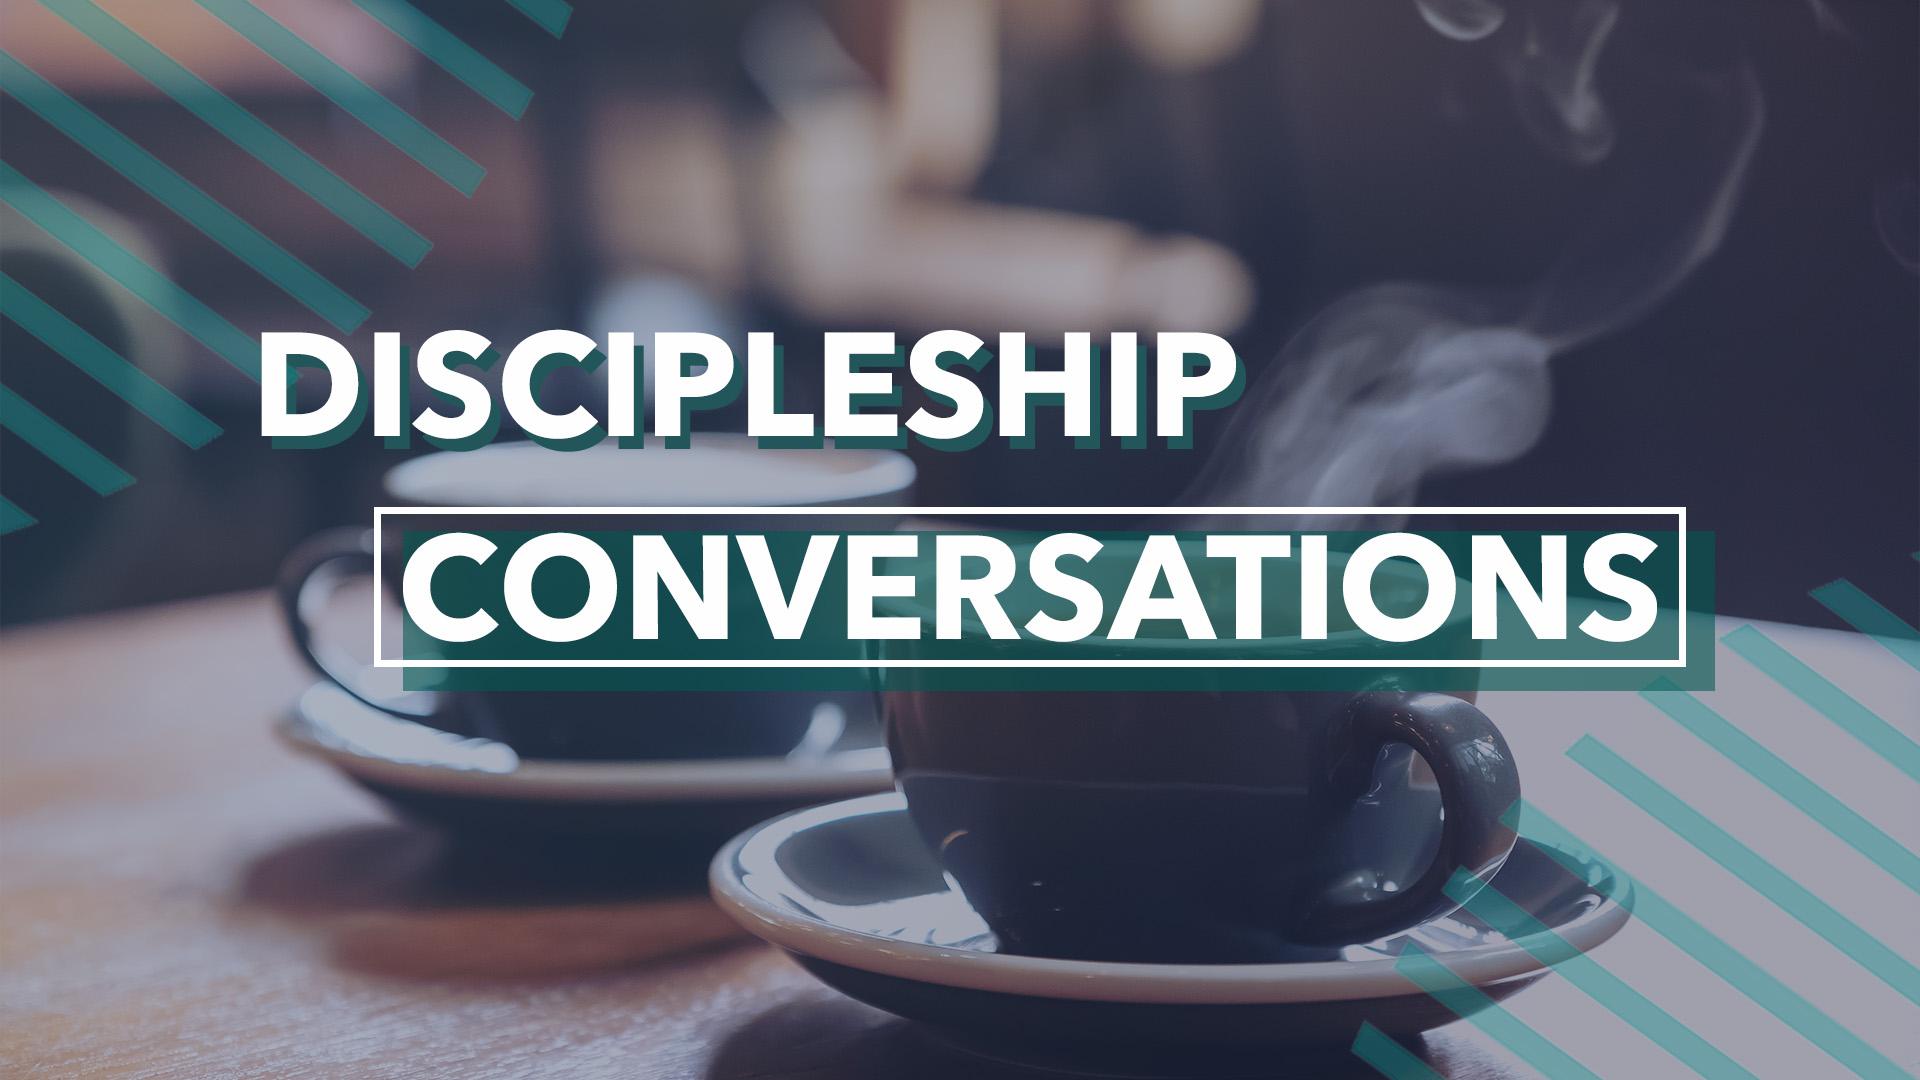 discipleship conversations.jpg